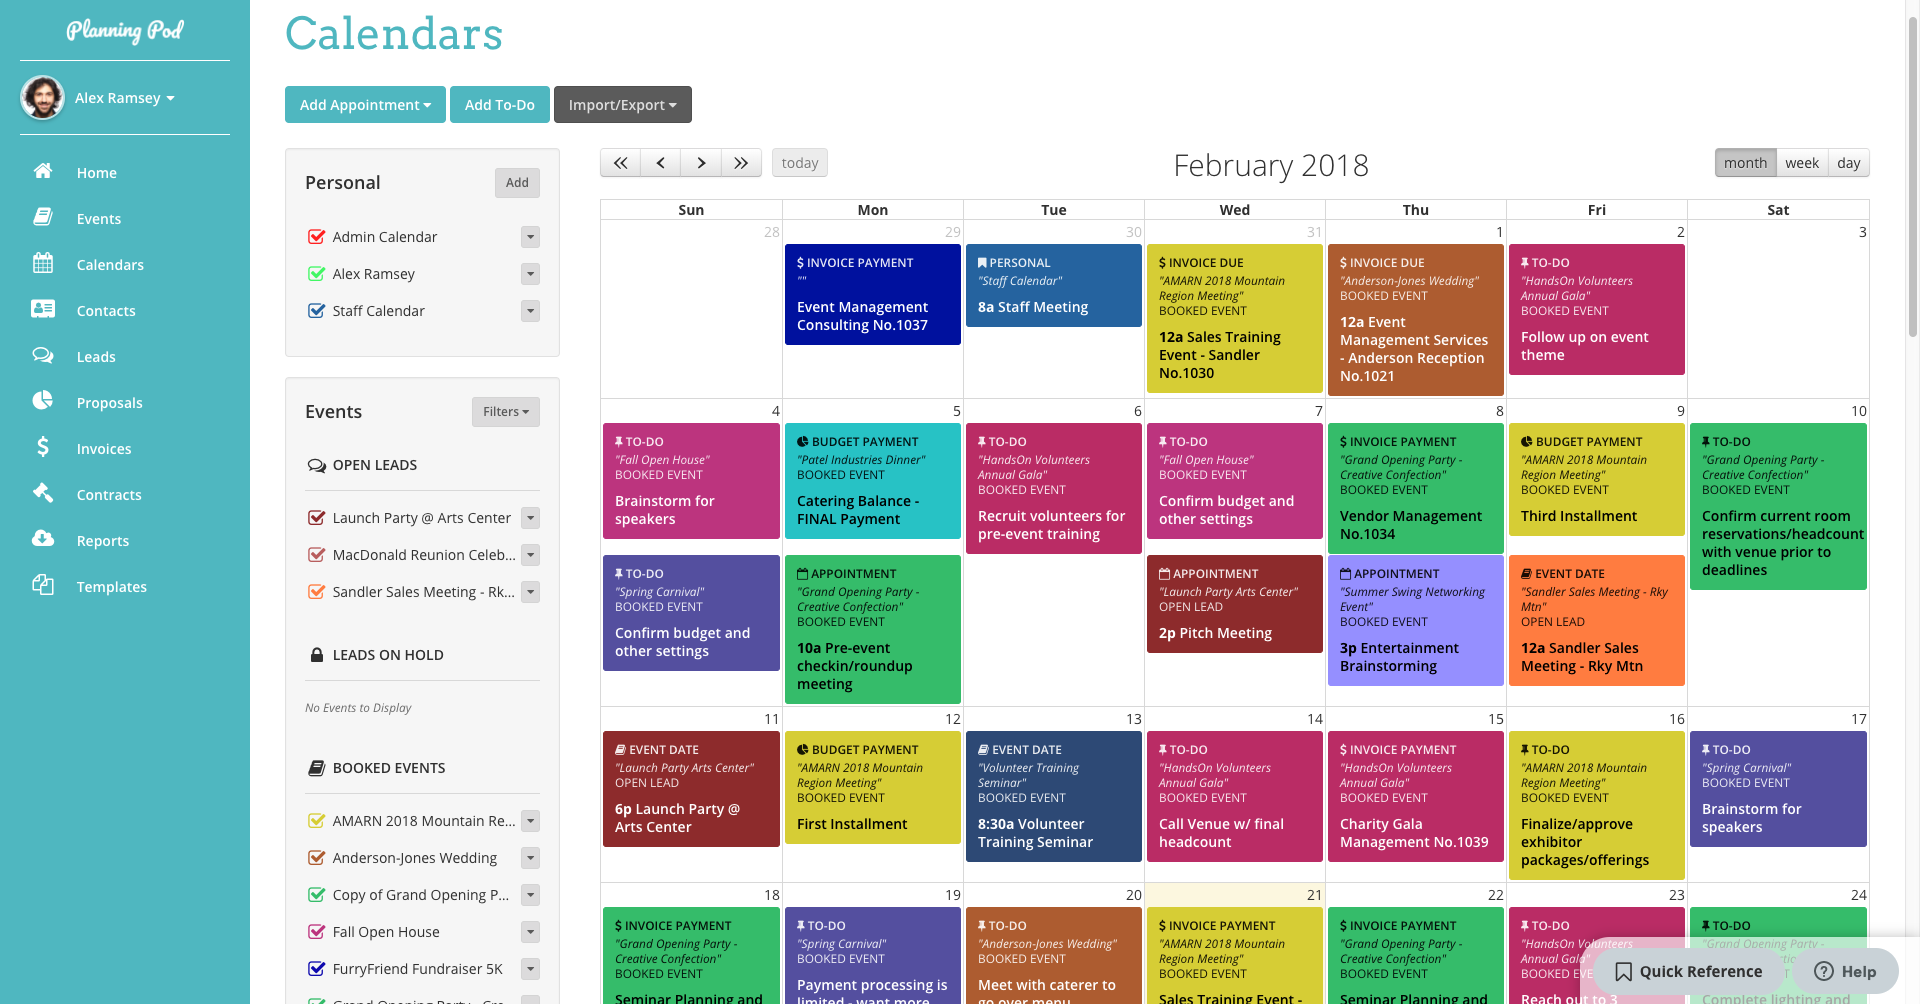 Planning Pod calendars